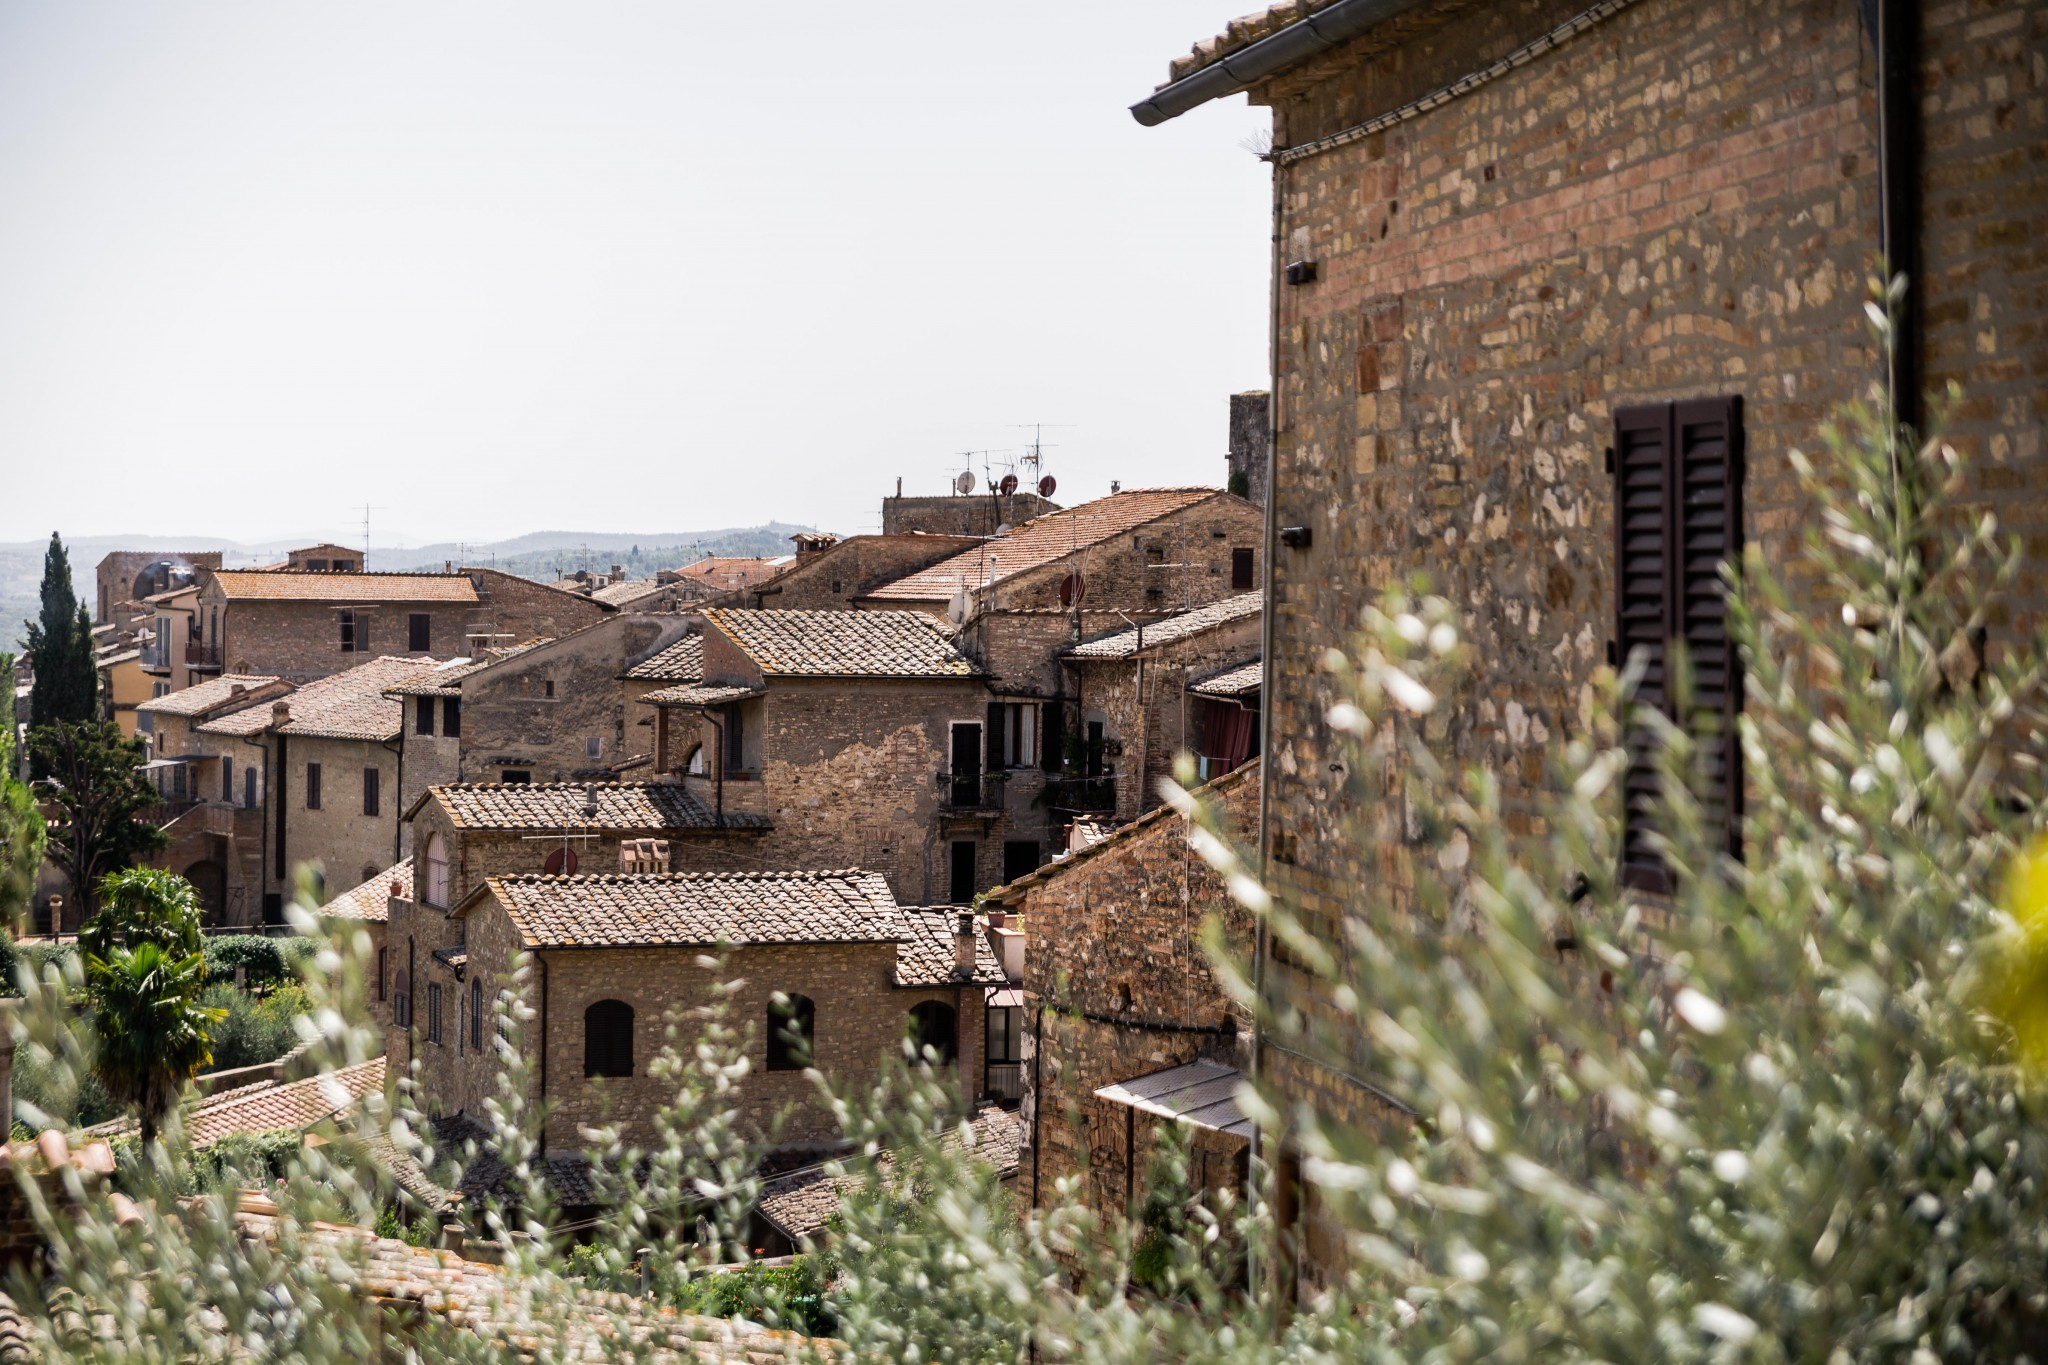 tuscany2 (37 of 39)